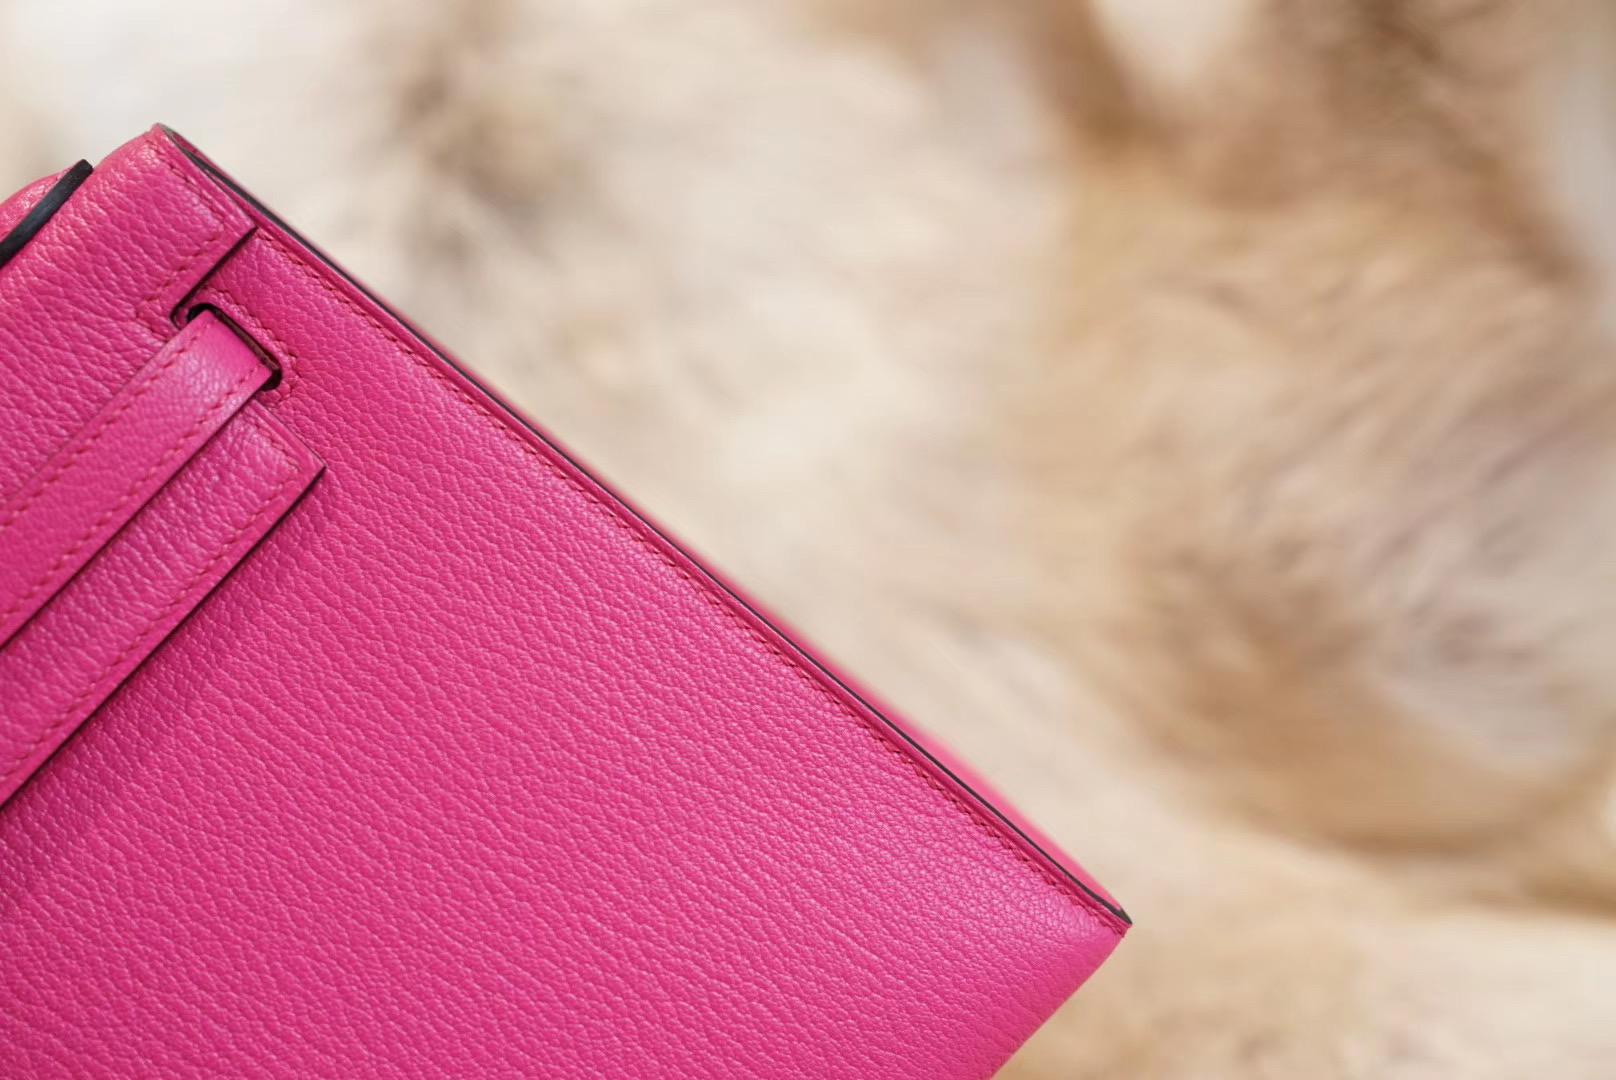 Kelly 桃粉色 KL25 原厂顶级山羊皮 法国蜡线 全手缝